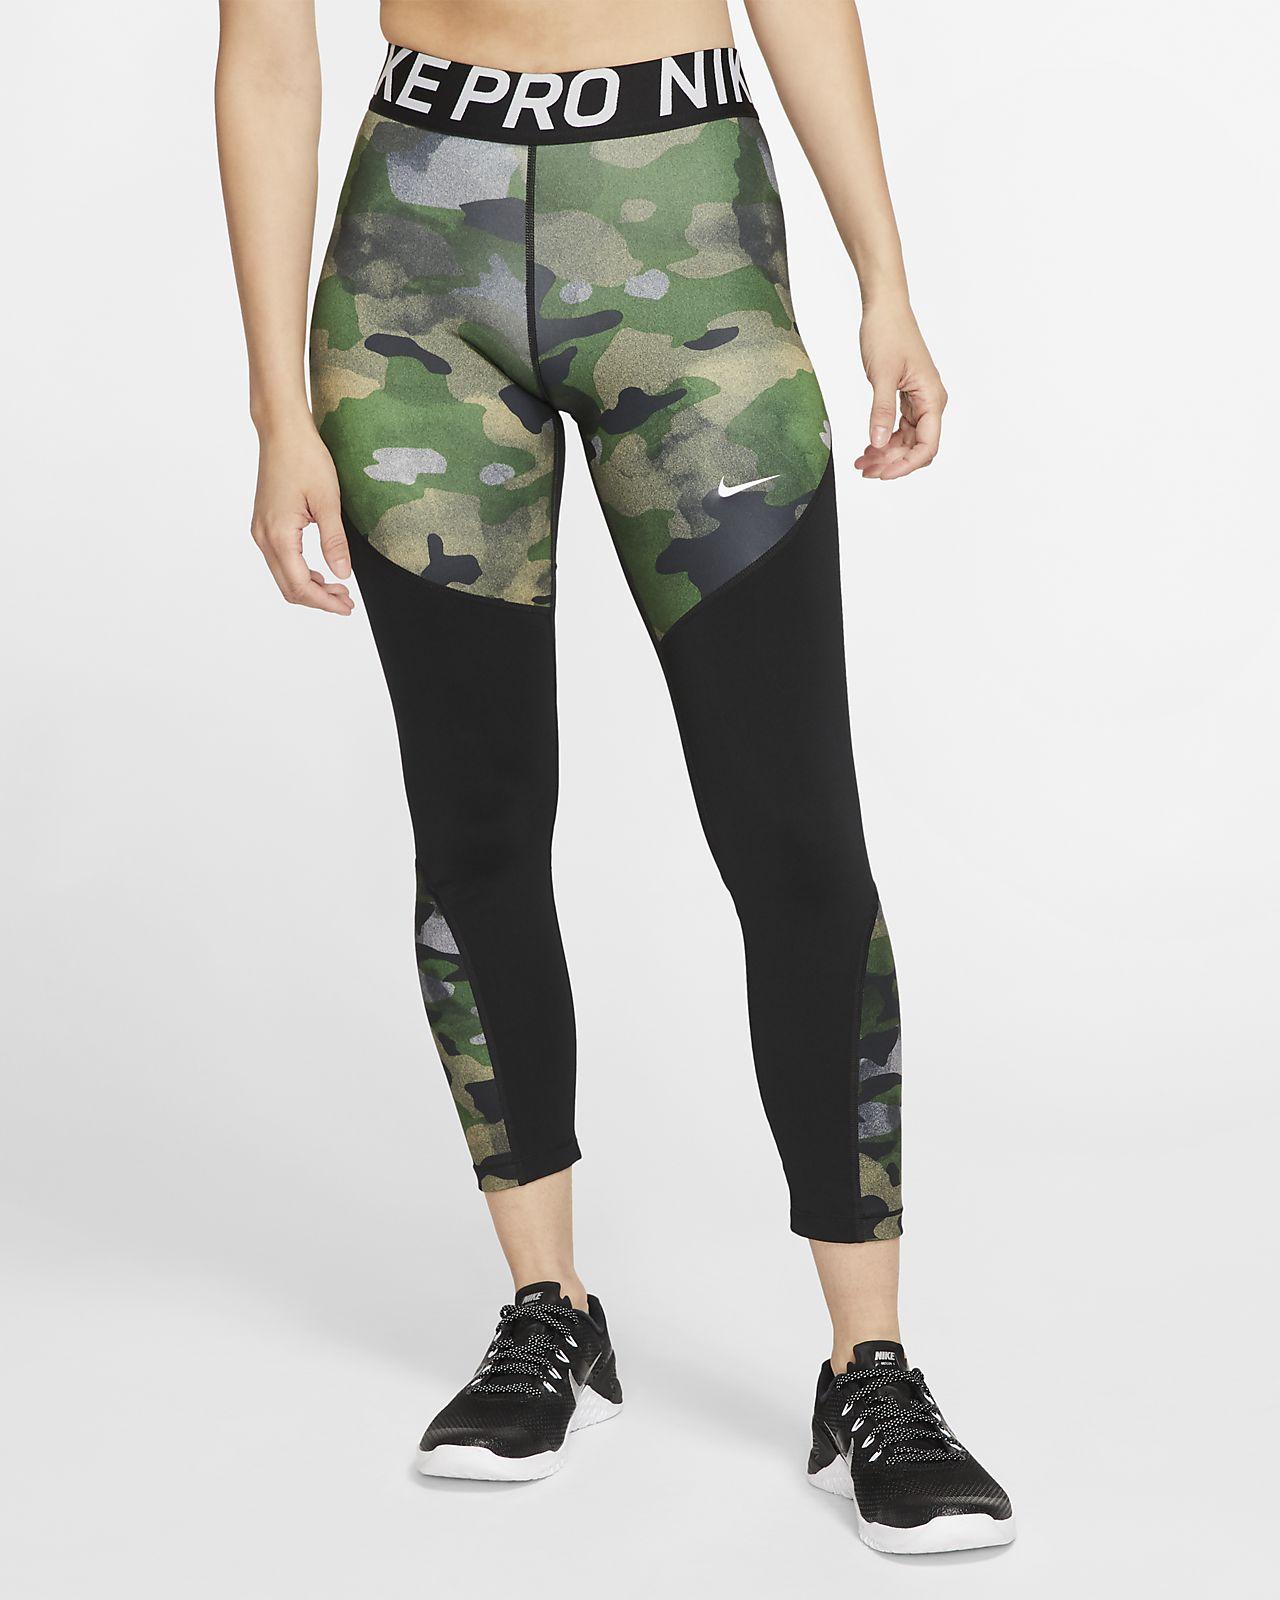 Legging camouflage 7/8 Nike Pro Icon Clash pour Femme